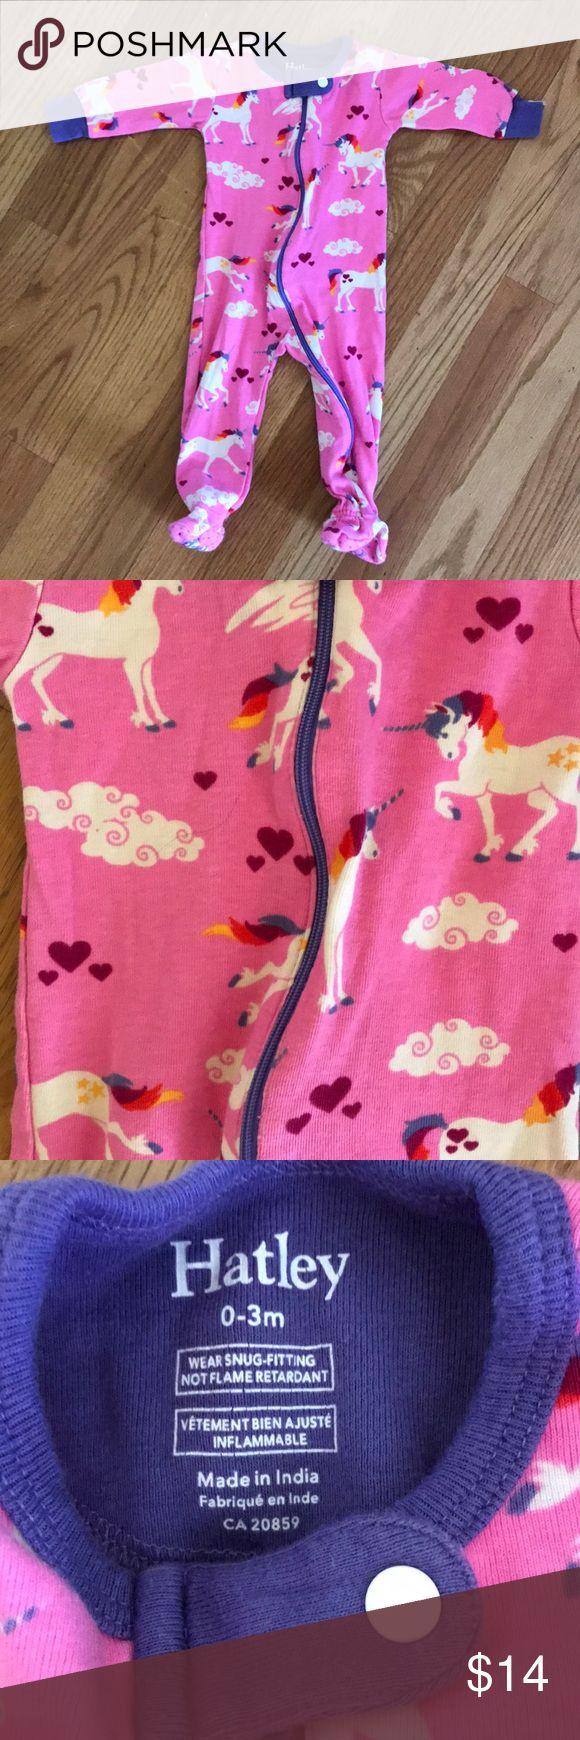 Hatley Unicorn Sleeper EUC. No stains or defects, smoke free home. Hatley Pajamas